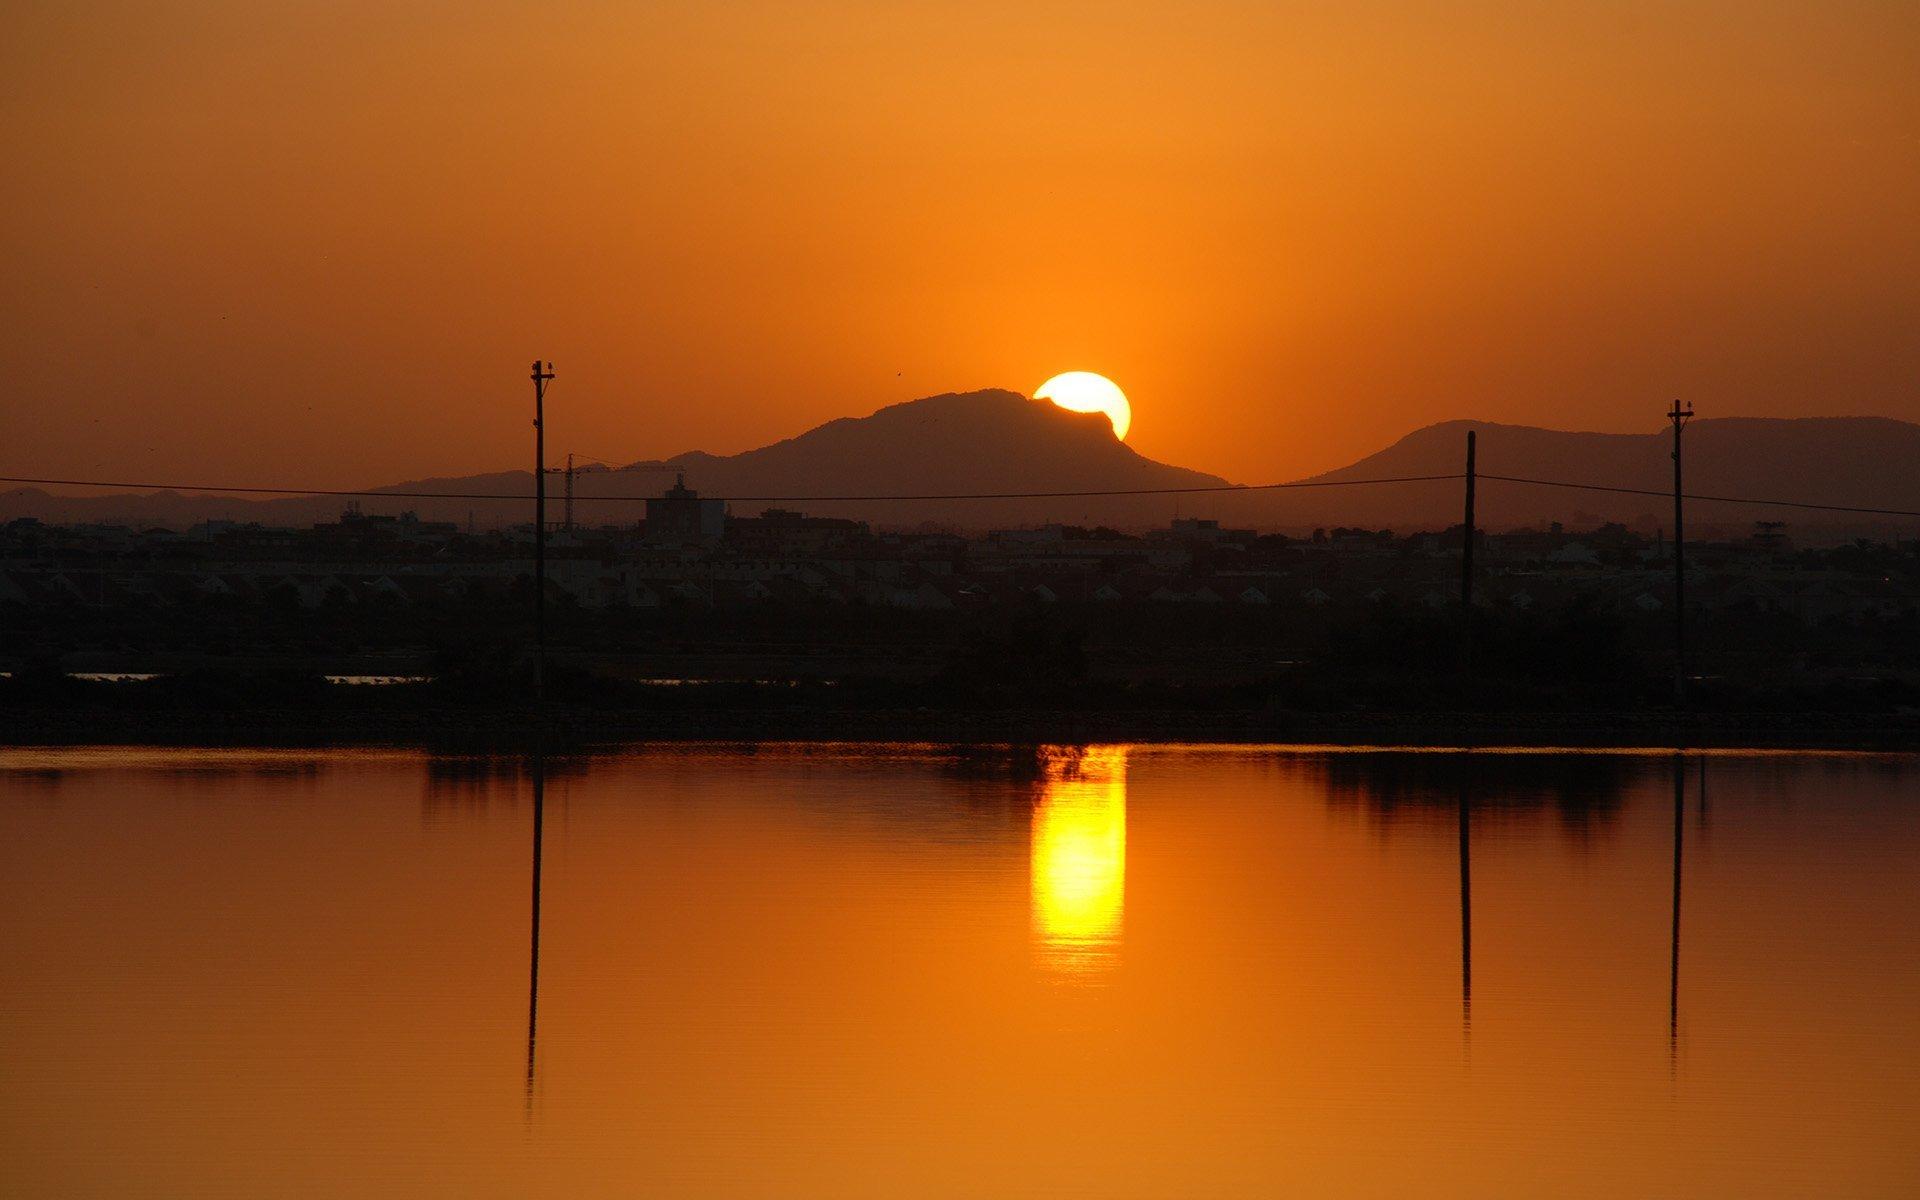 turuncu gün batımı